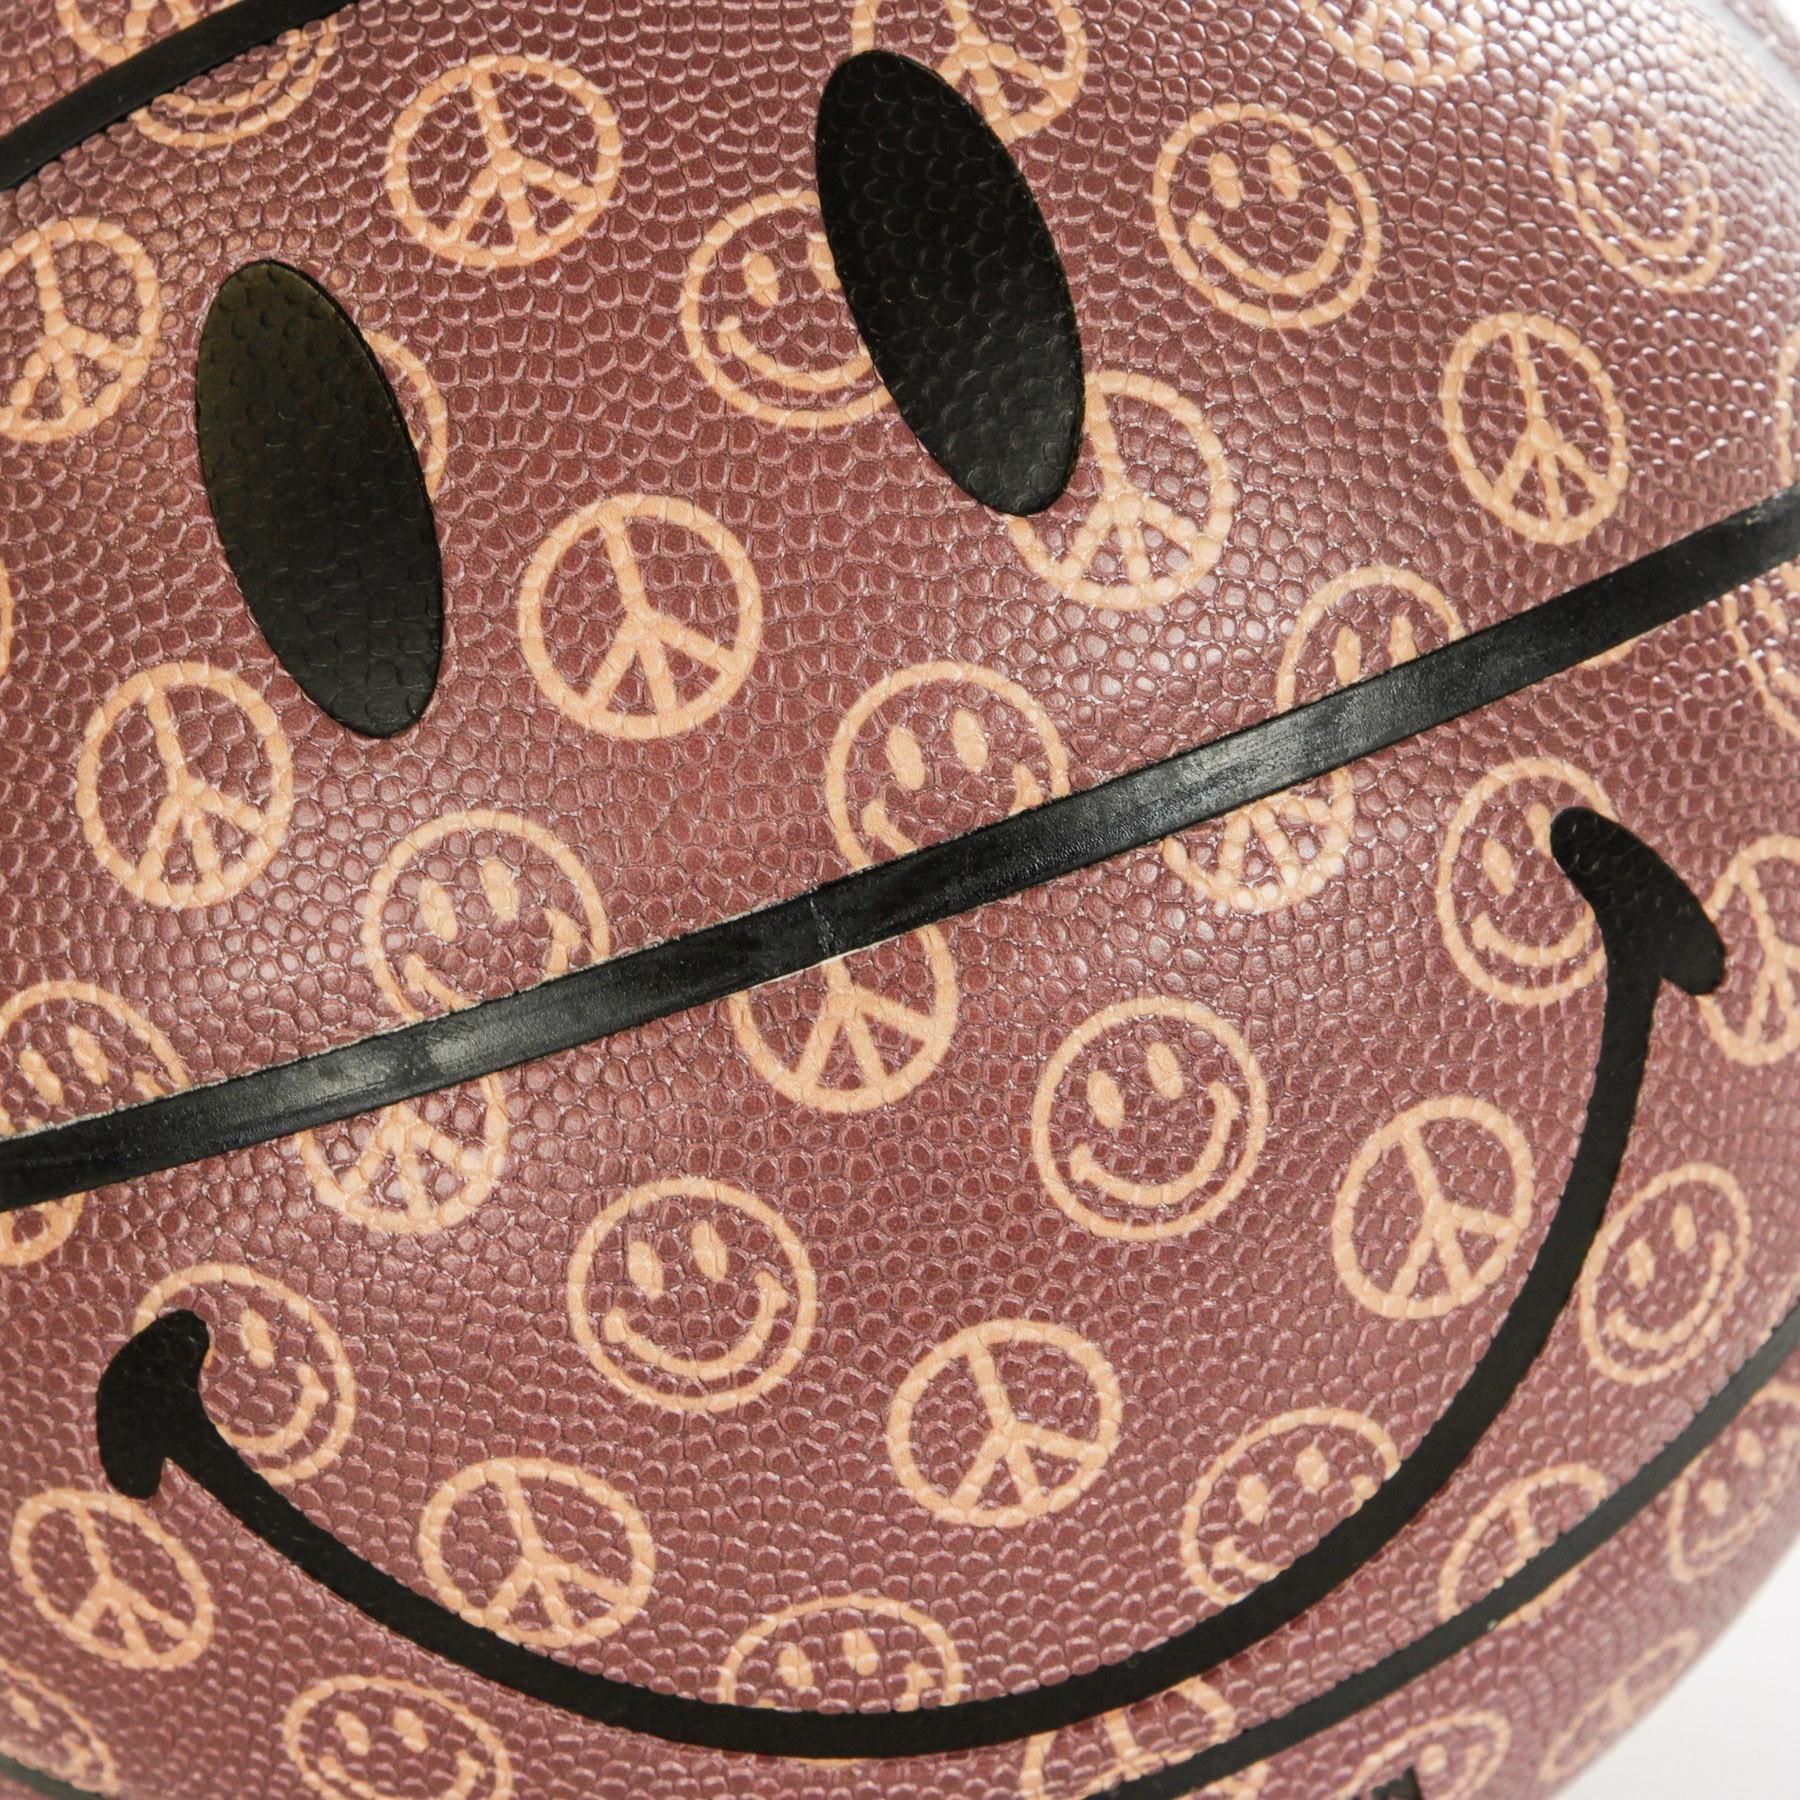 PALLONE SMILEY CABANA BASKETBALL SIZE 7